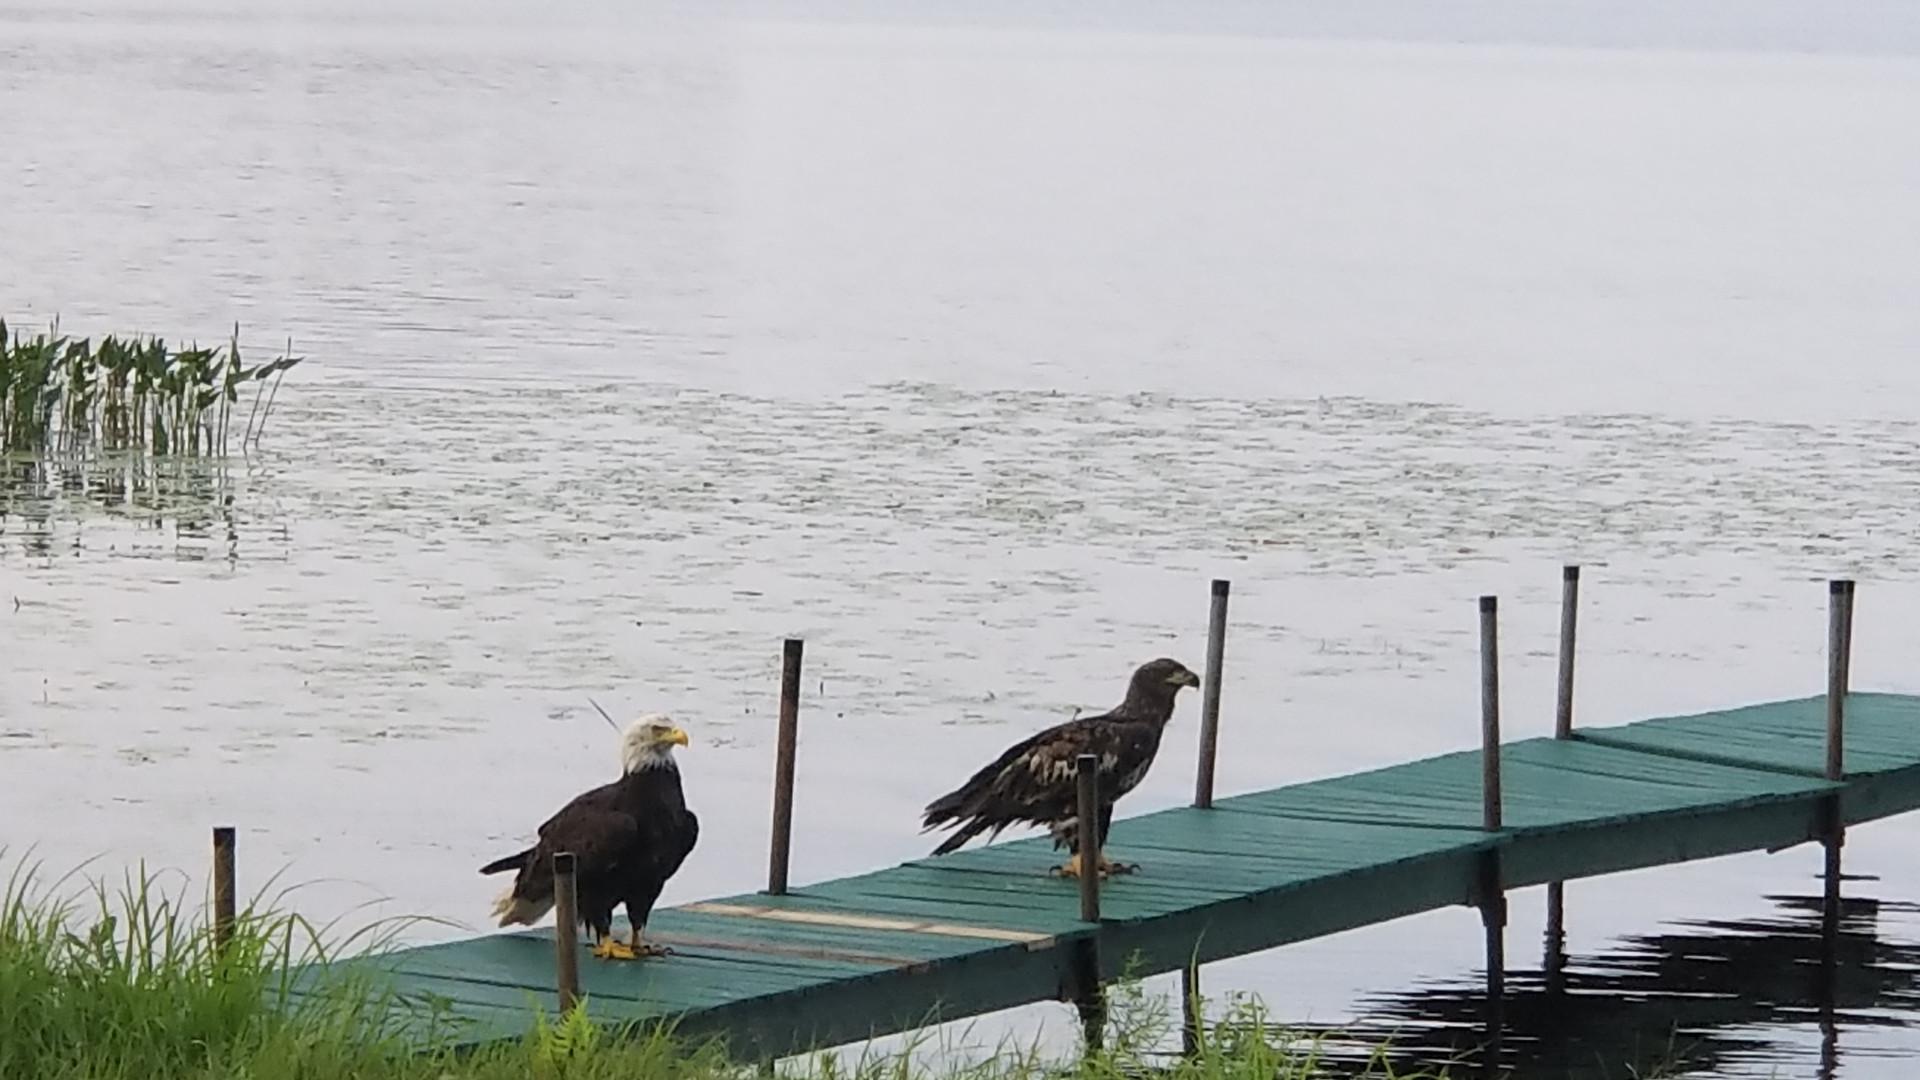 Eagles on Pier